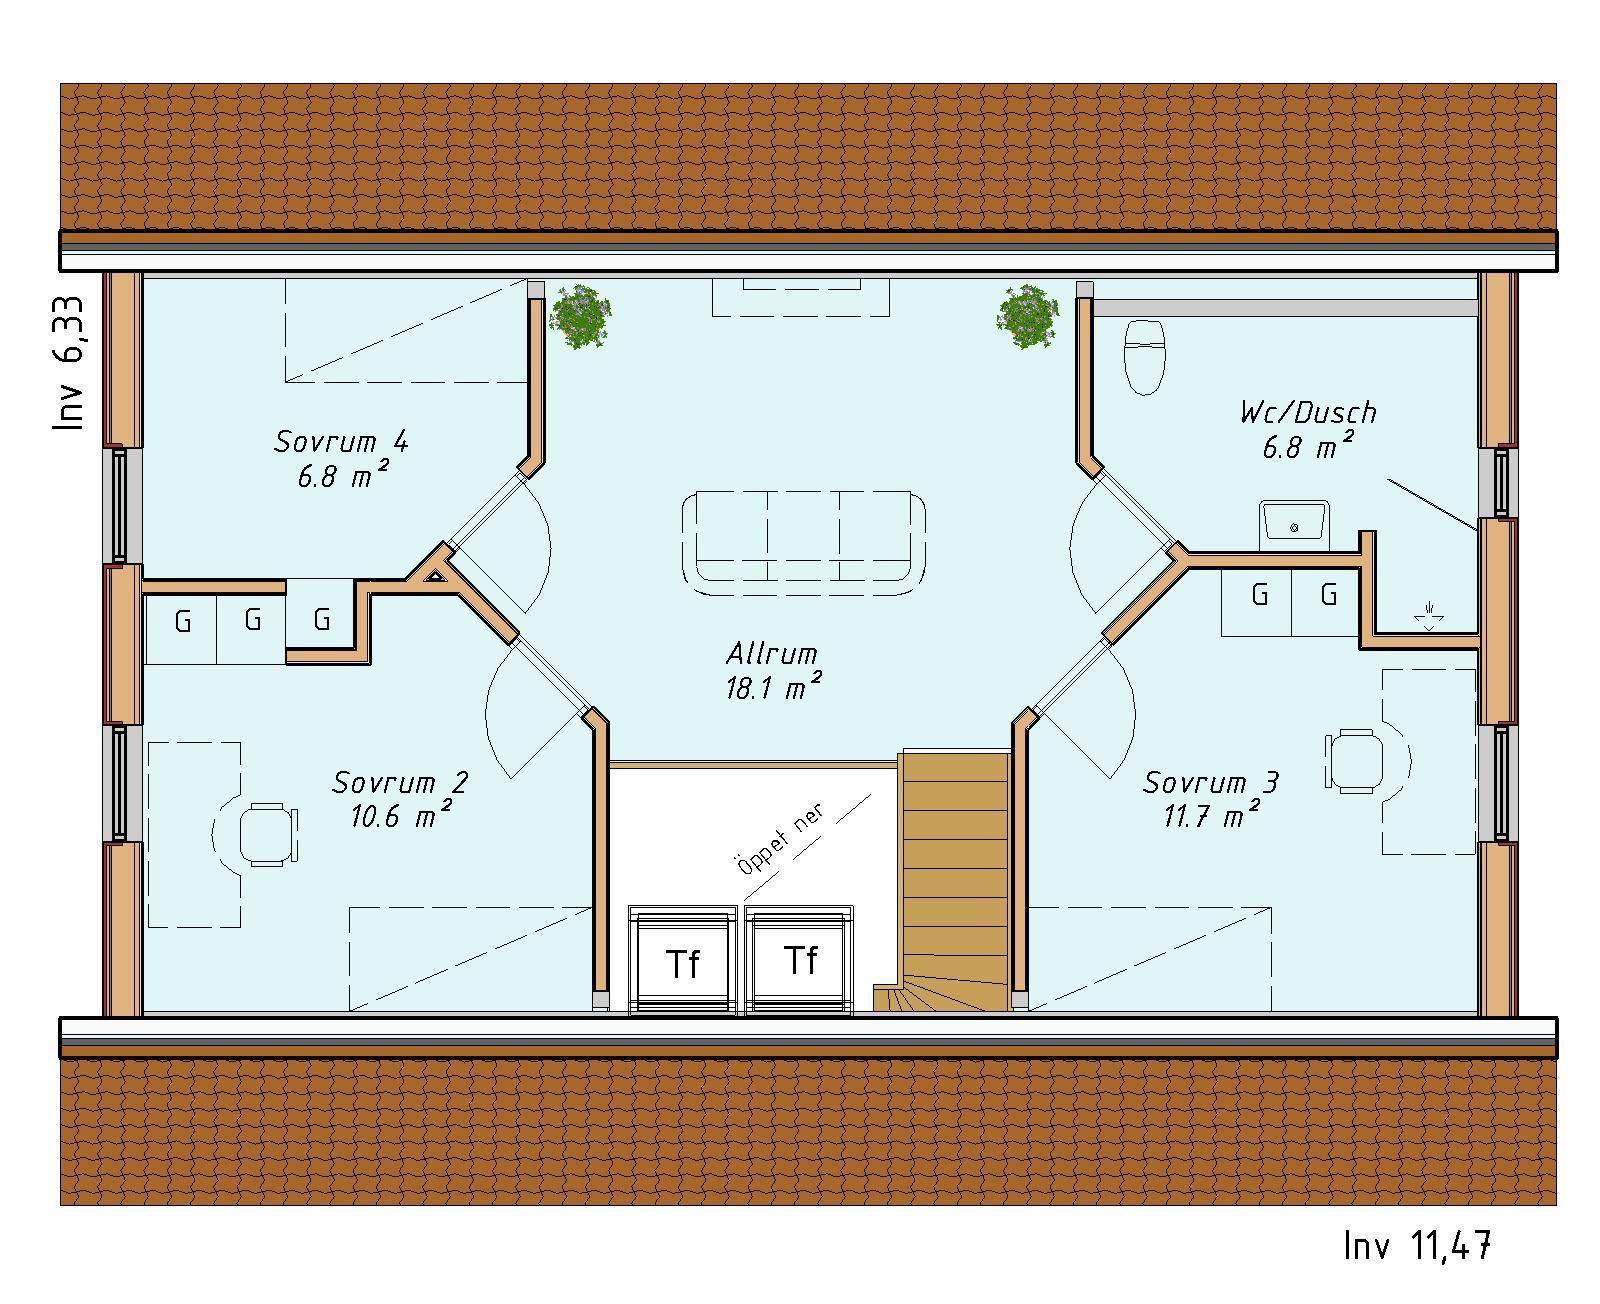 planlosningsbild 2 av HEALT